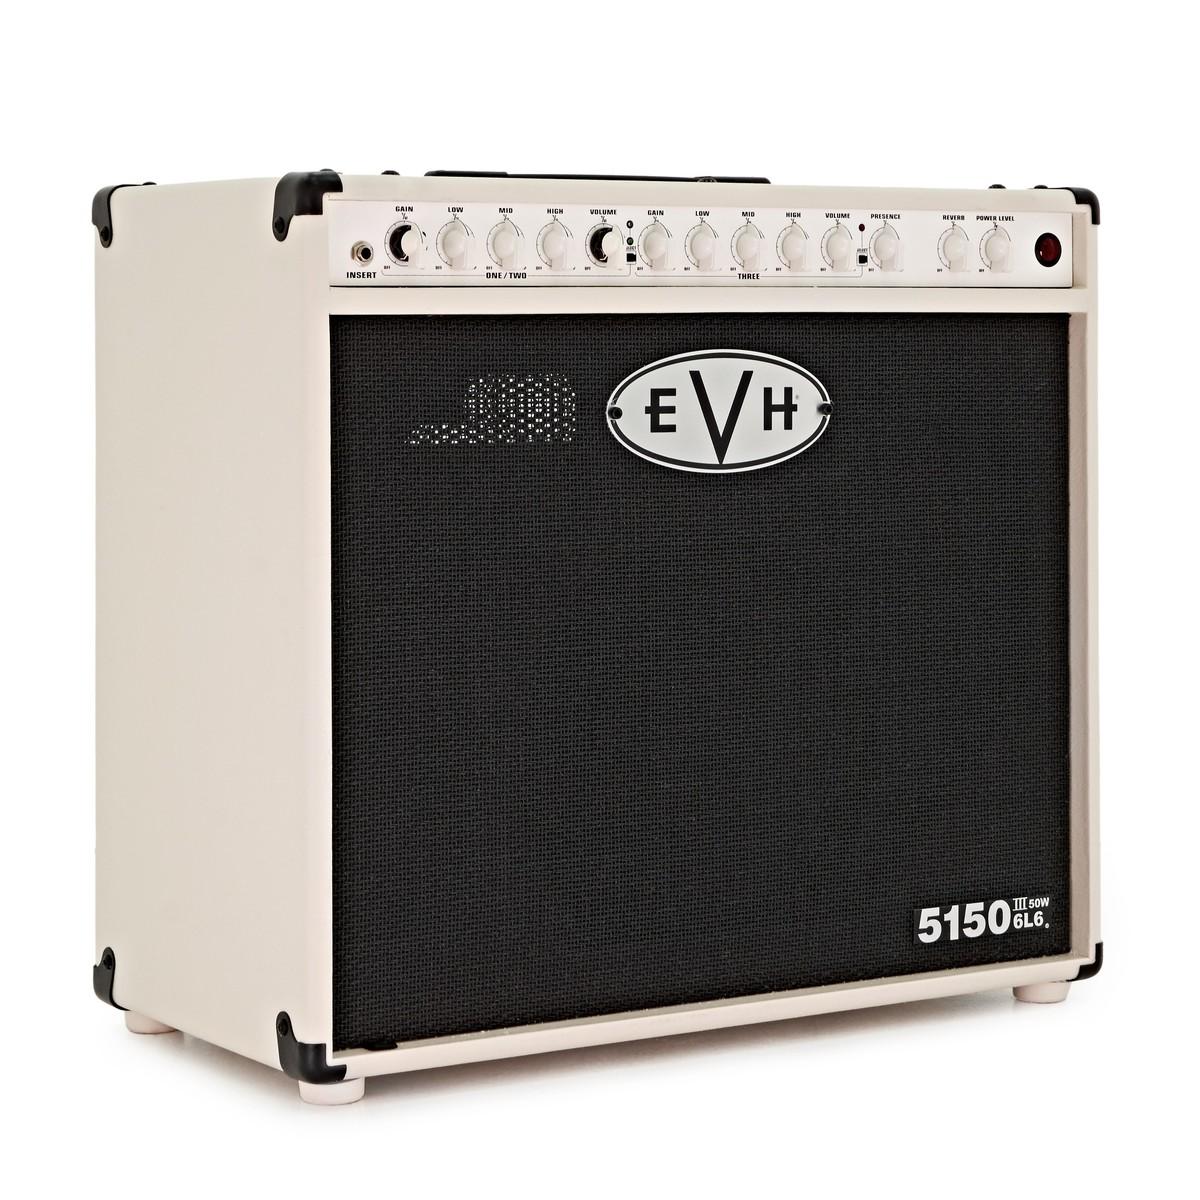 68f2ad4e6e2 EVH 5150 III 6L6 50W 1x12 Valve Combo